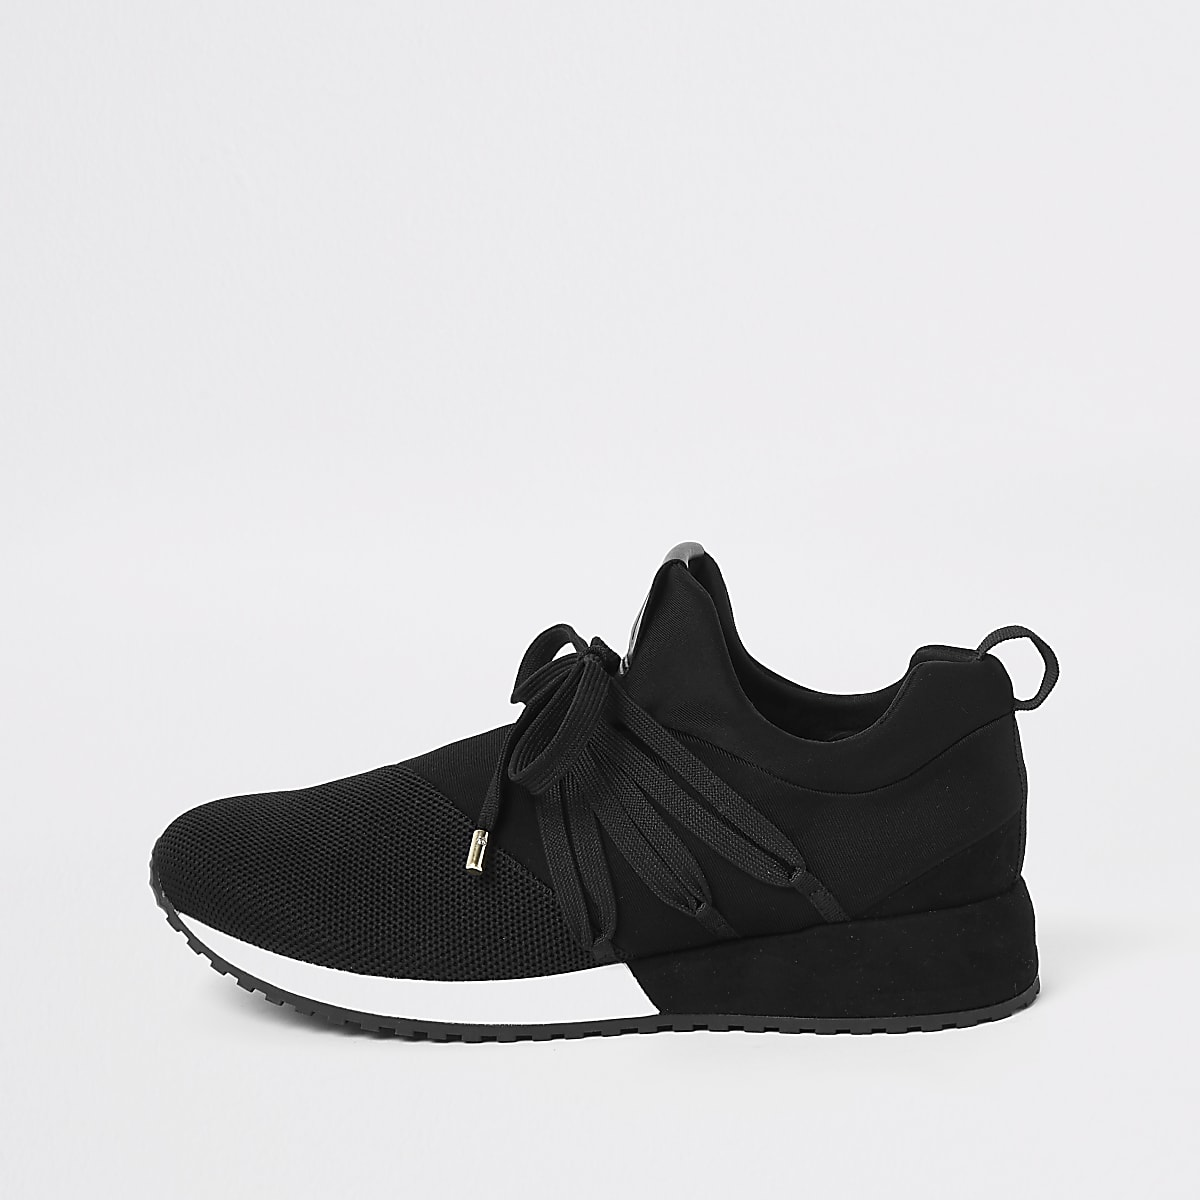 Black RI lace up runner sneakers